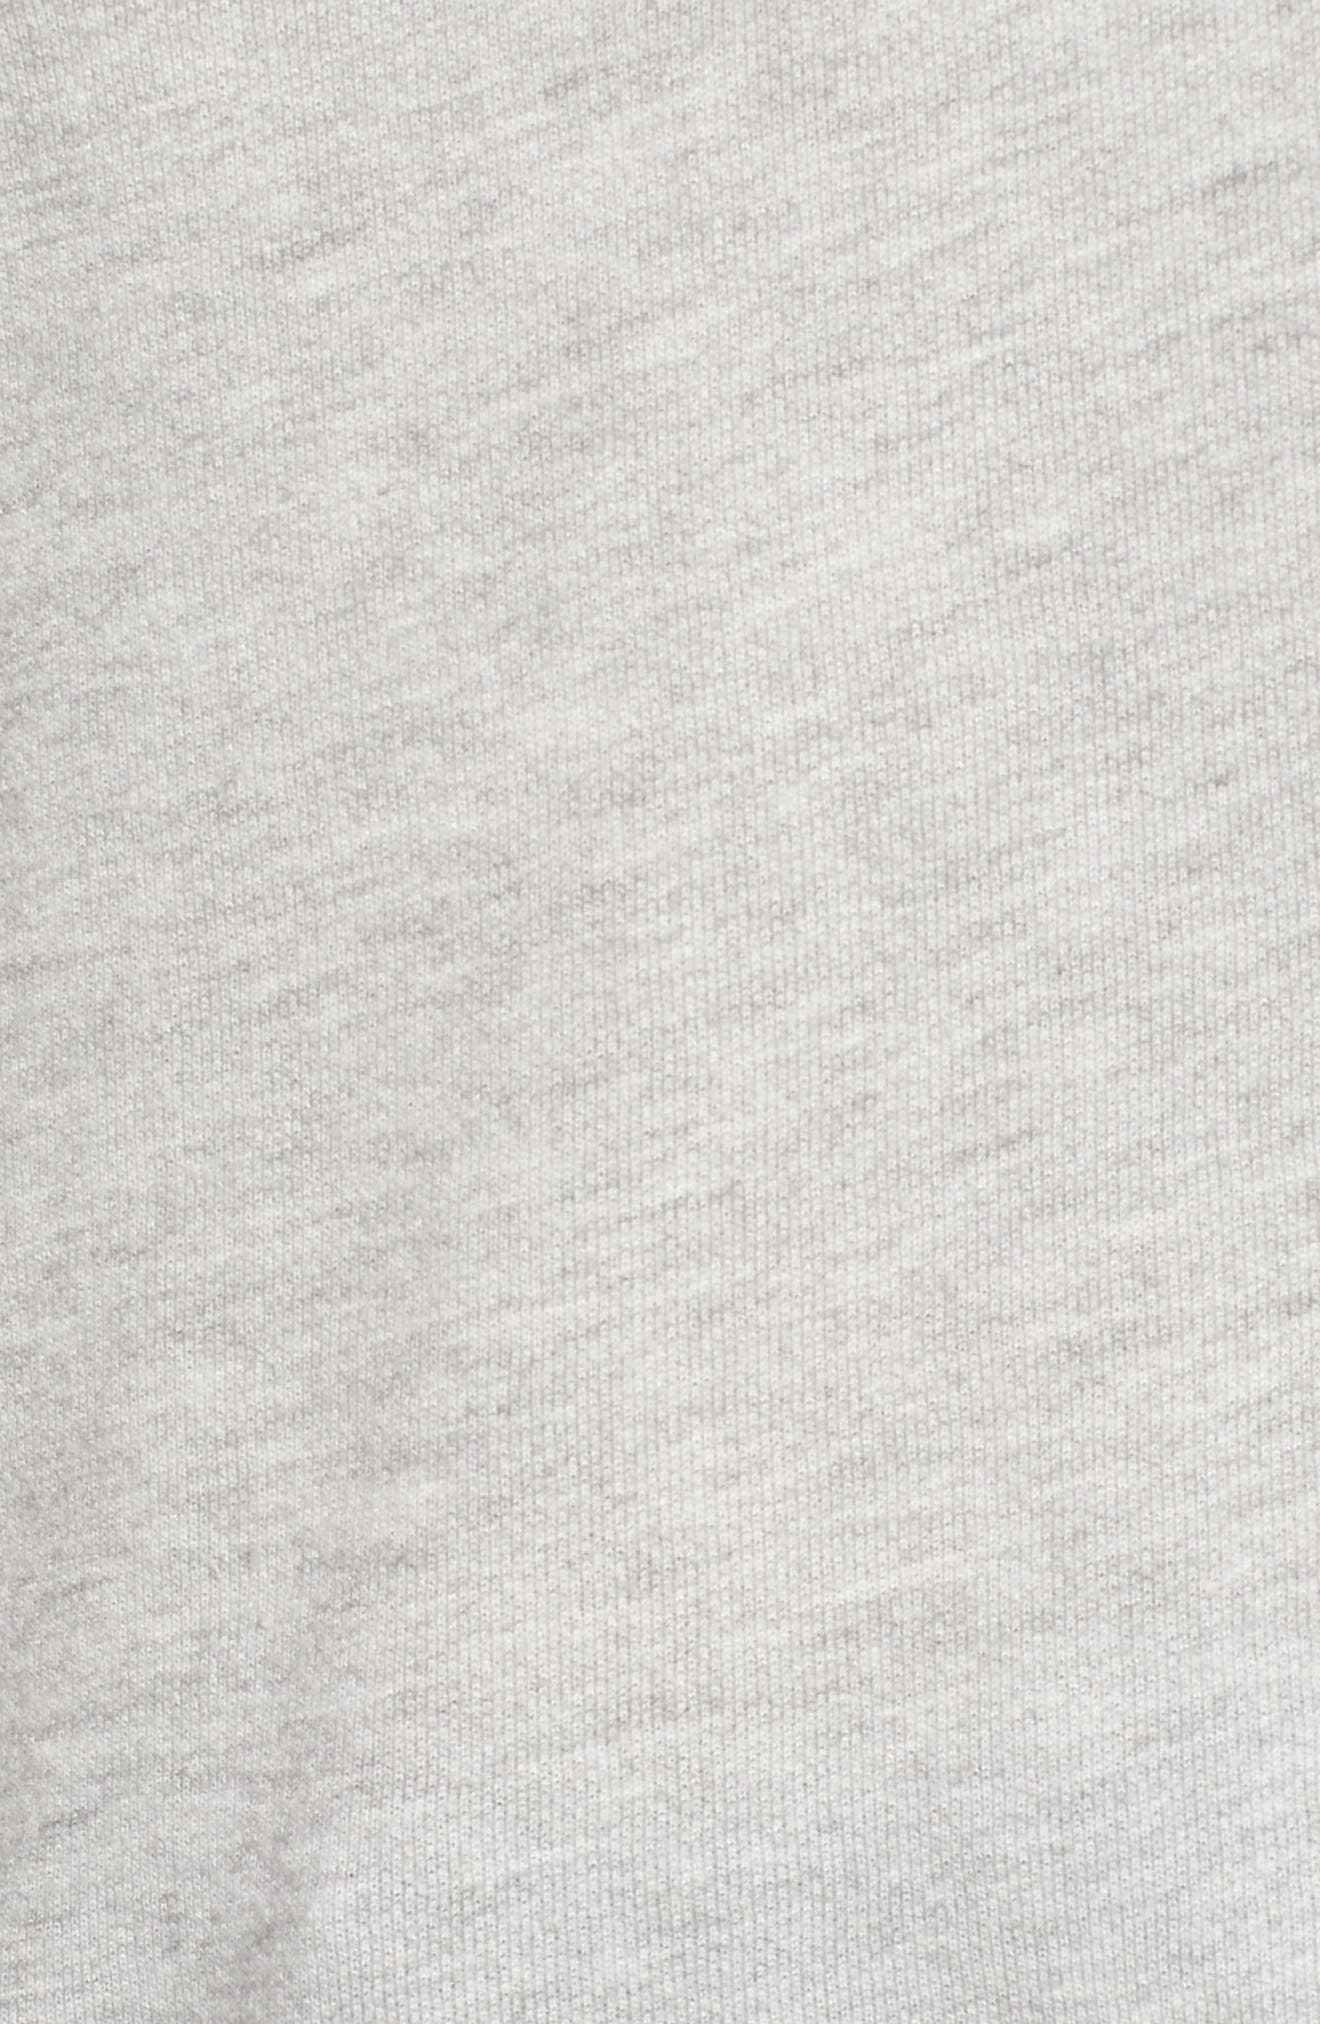 Off the Shoulder Sweatshirt,                             Alternate thumbnail 5, color,                             020